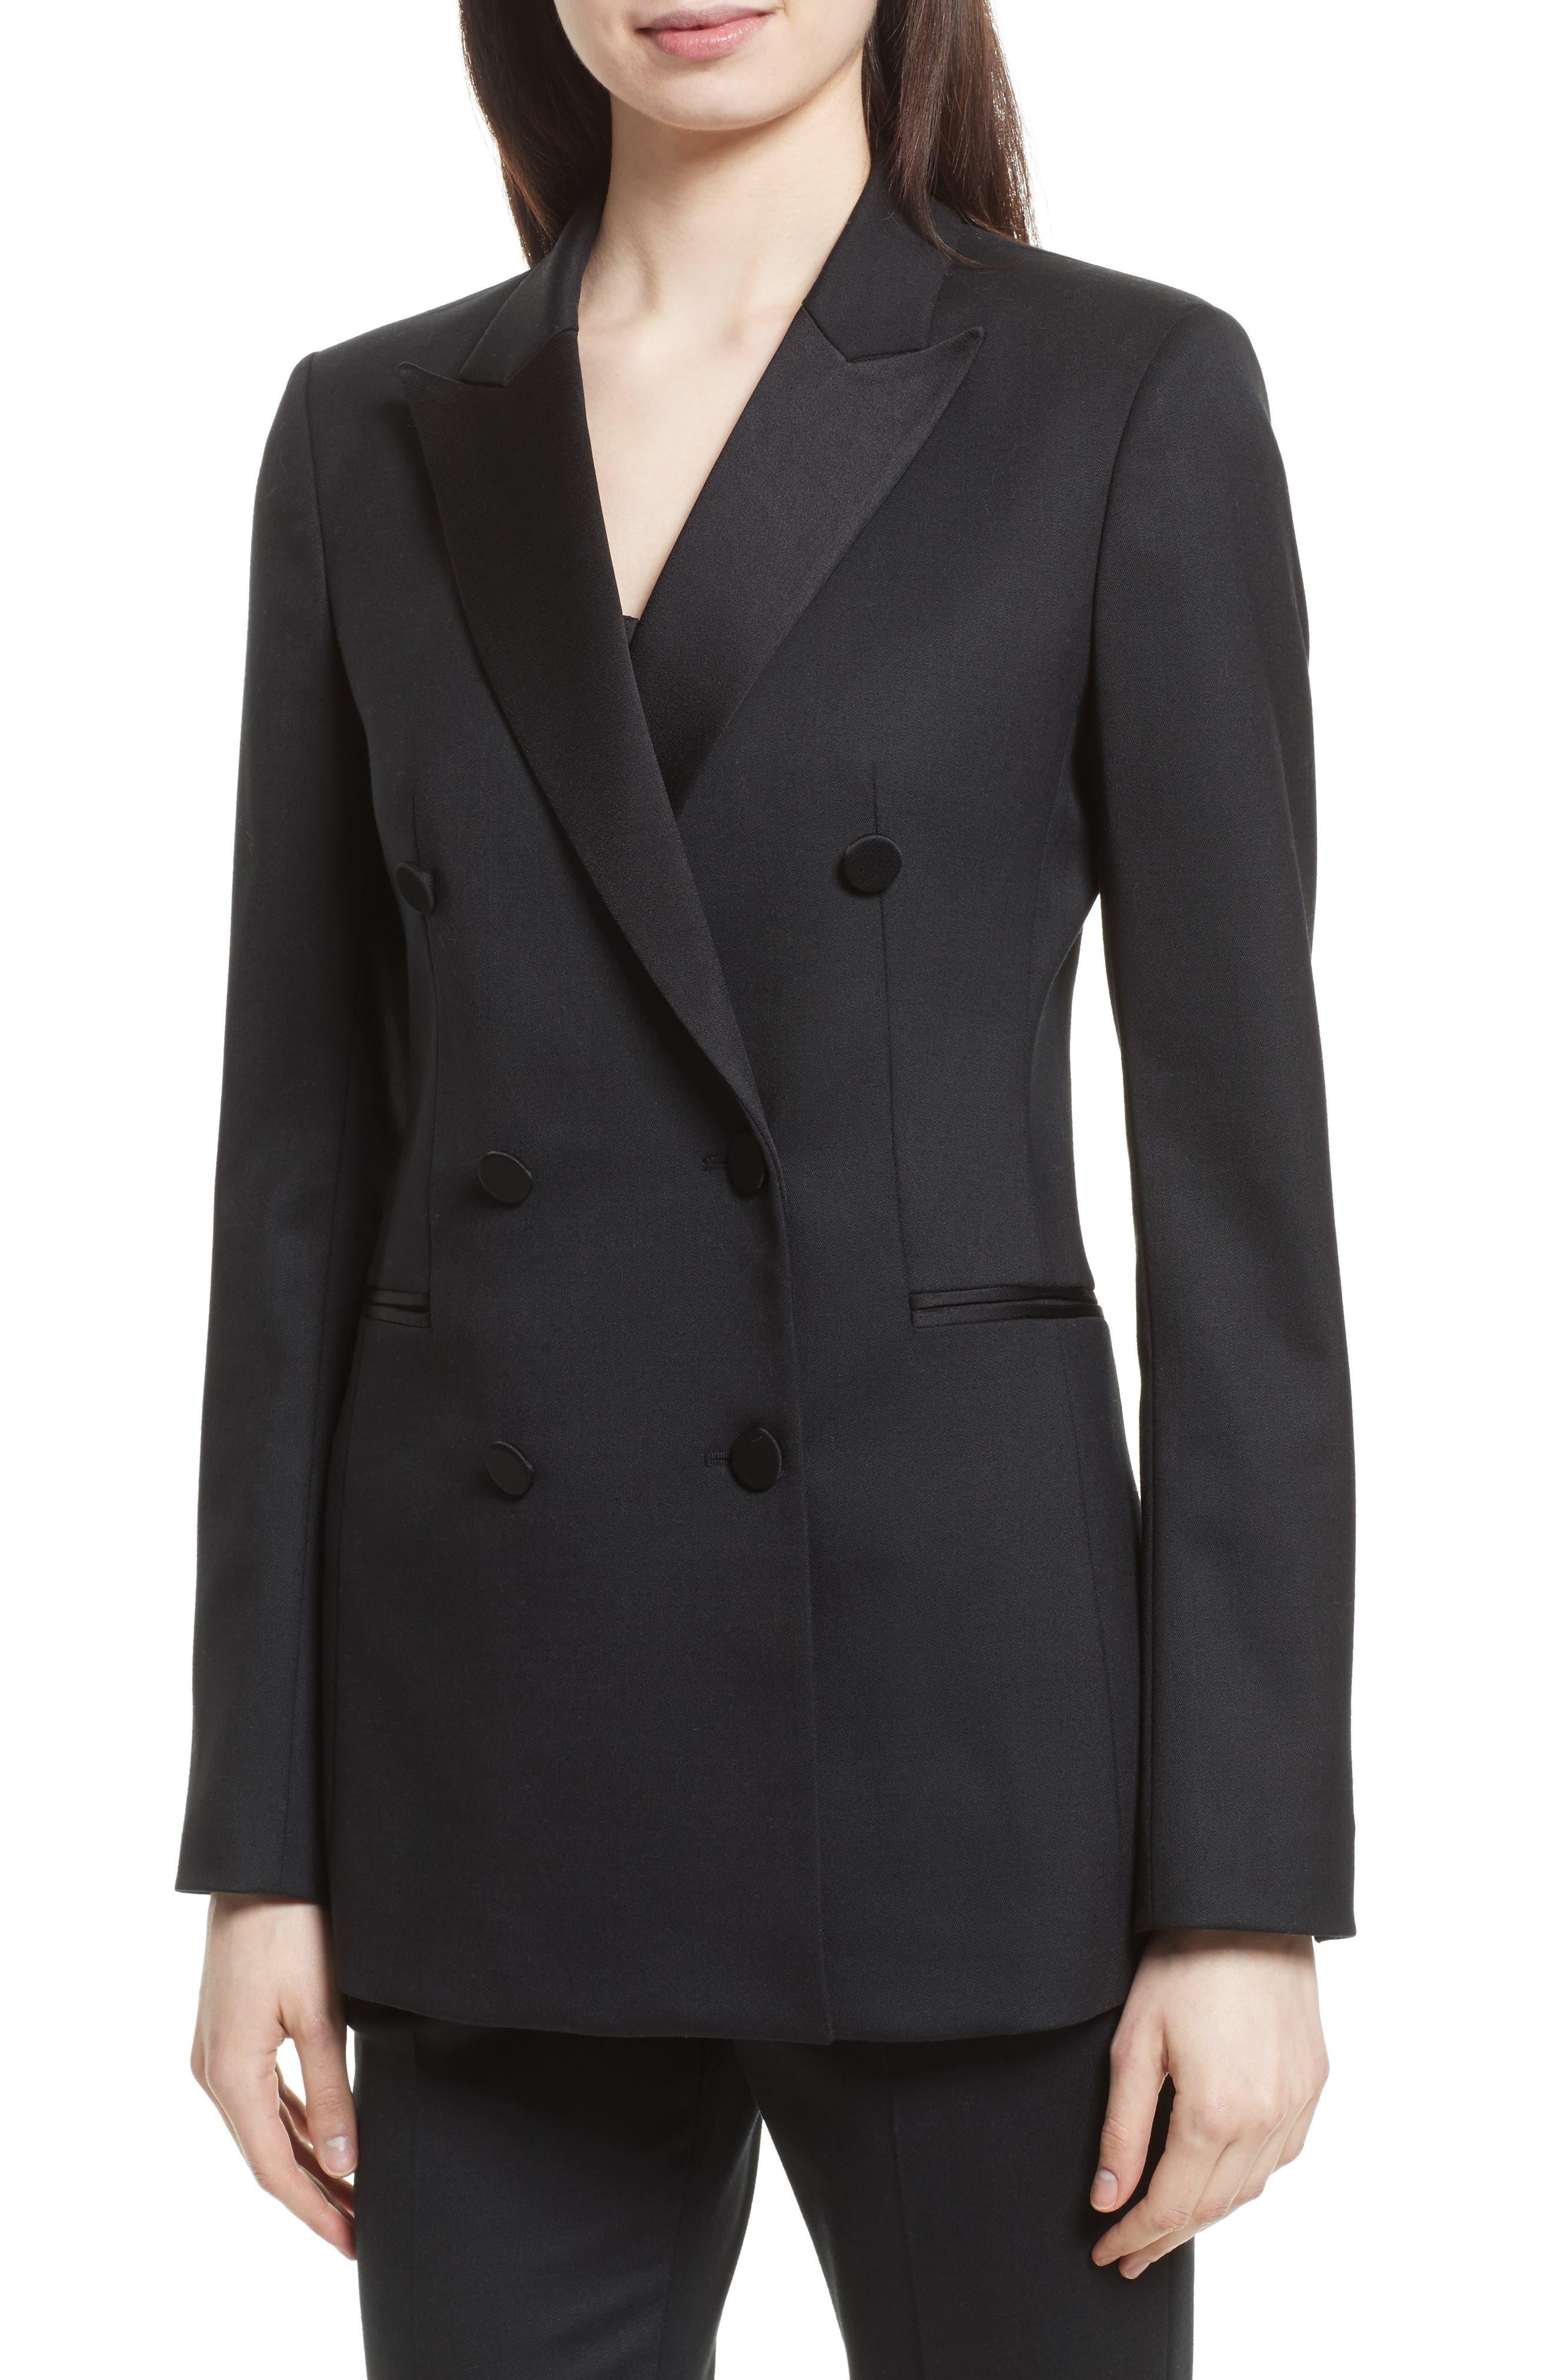 Wool Blend Tuxedo Jacket,                             Alternate thumbnail 4, color,                             Black